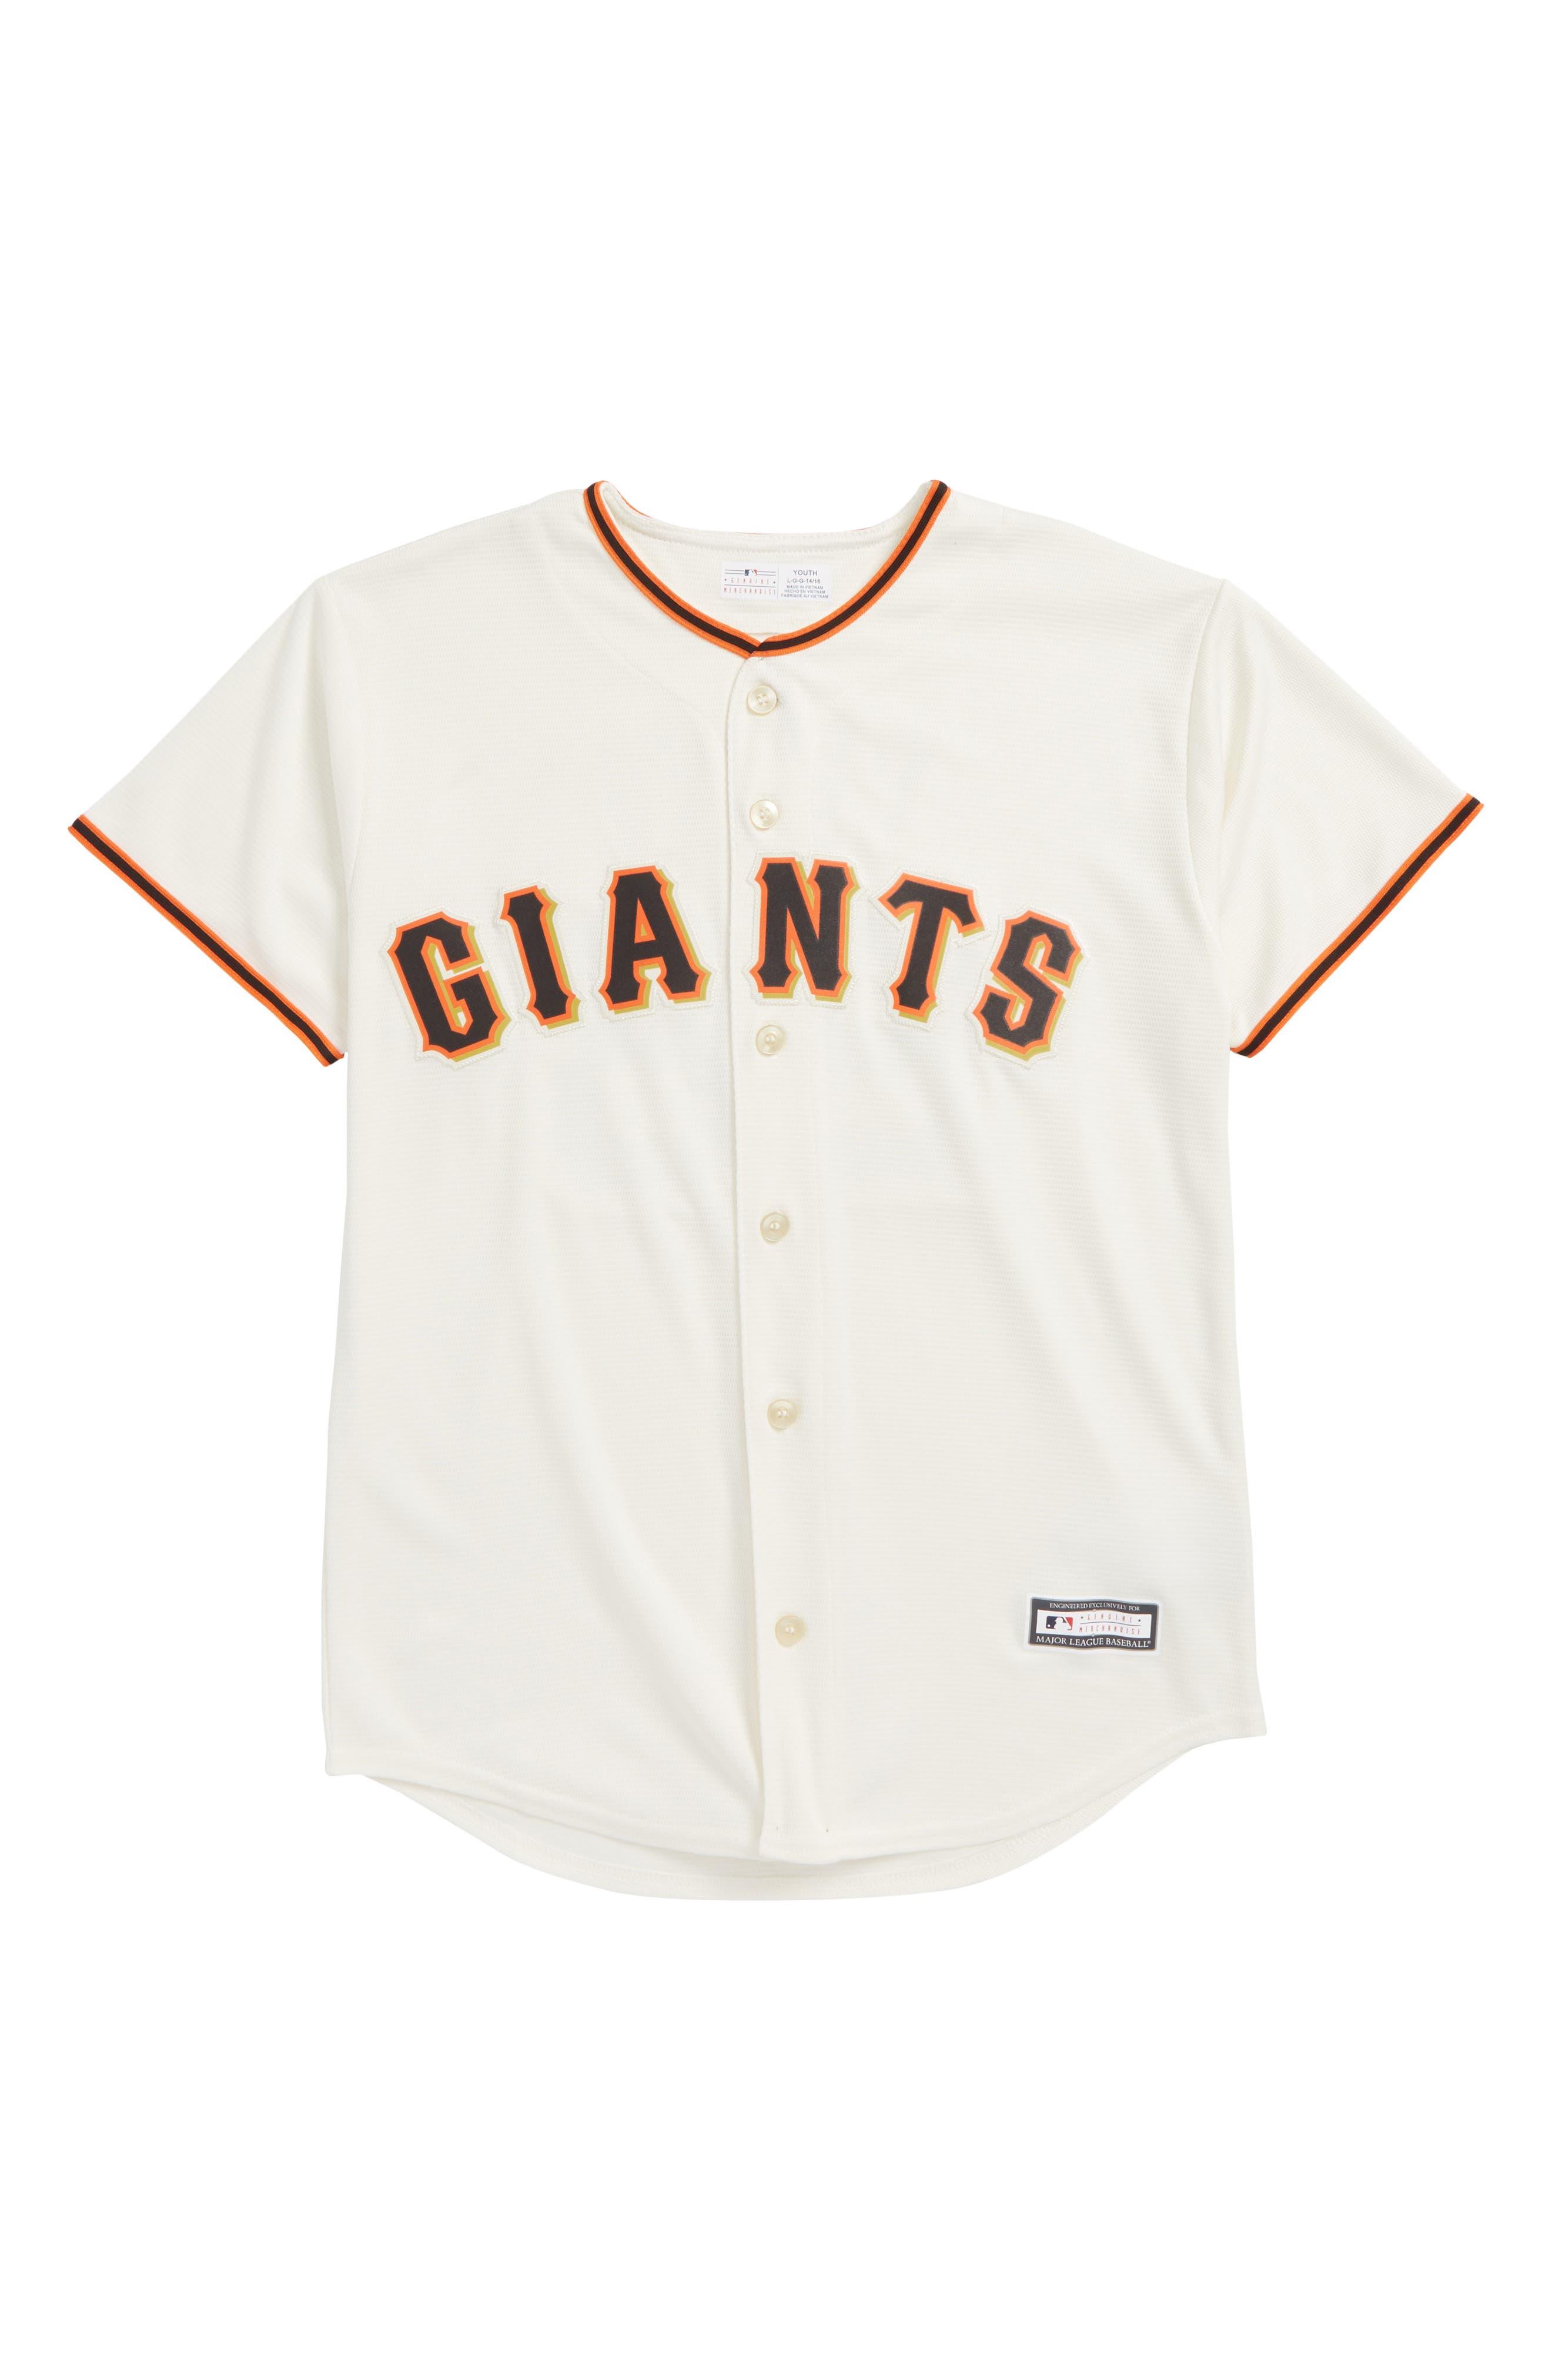 San Francisco Giants - Buster Posey Baseball Jersey,                             Main thumbnail 1, color,                             White